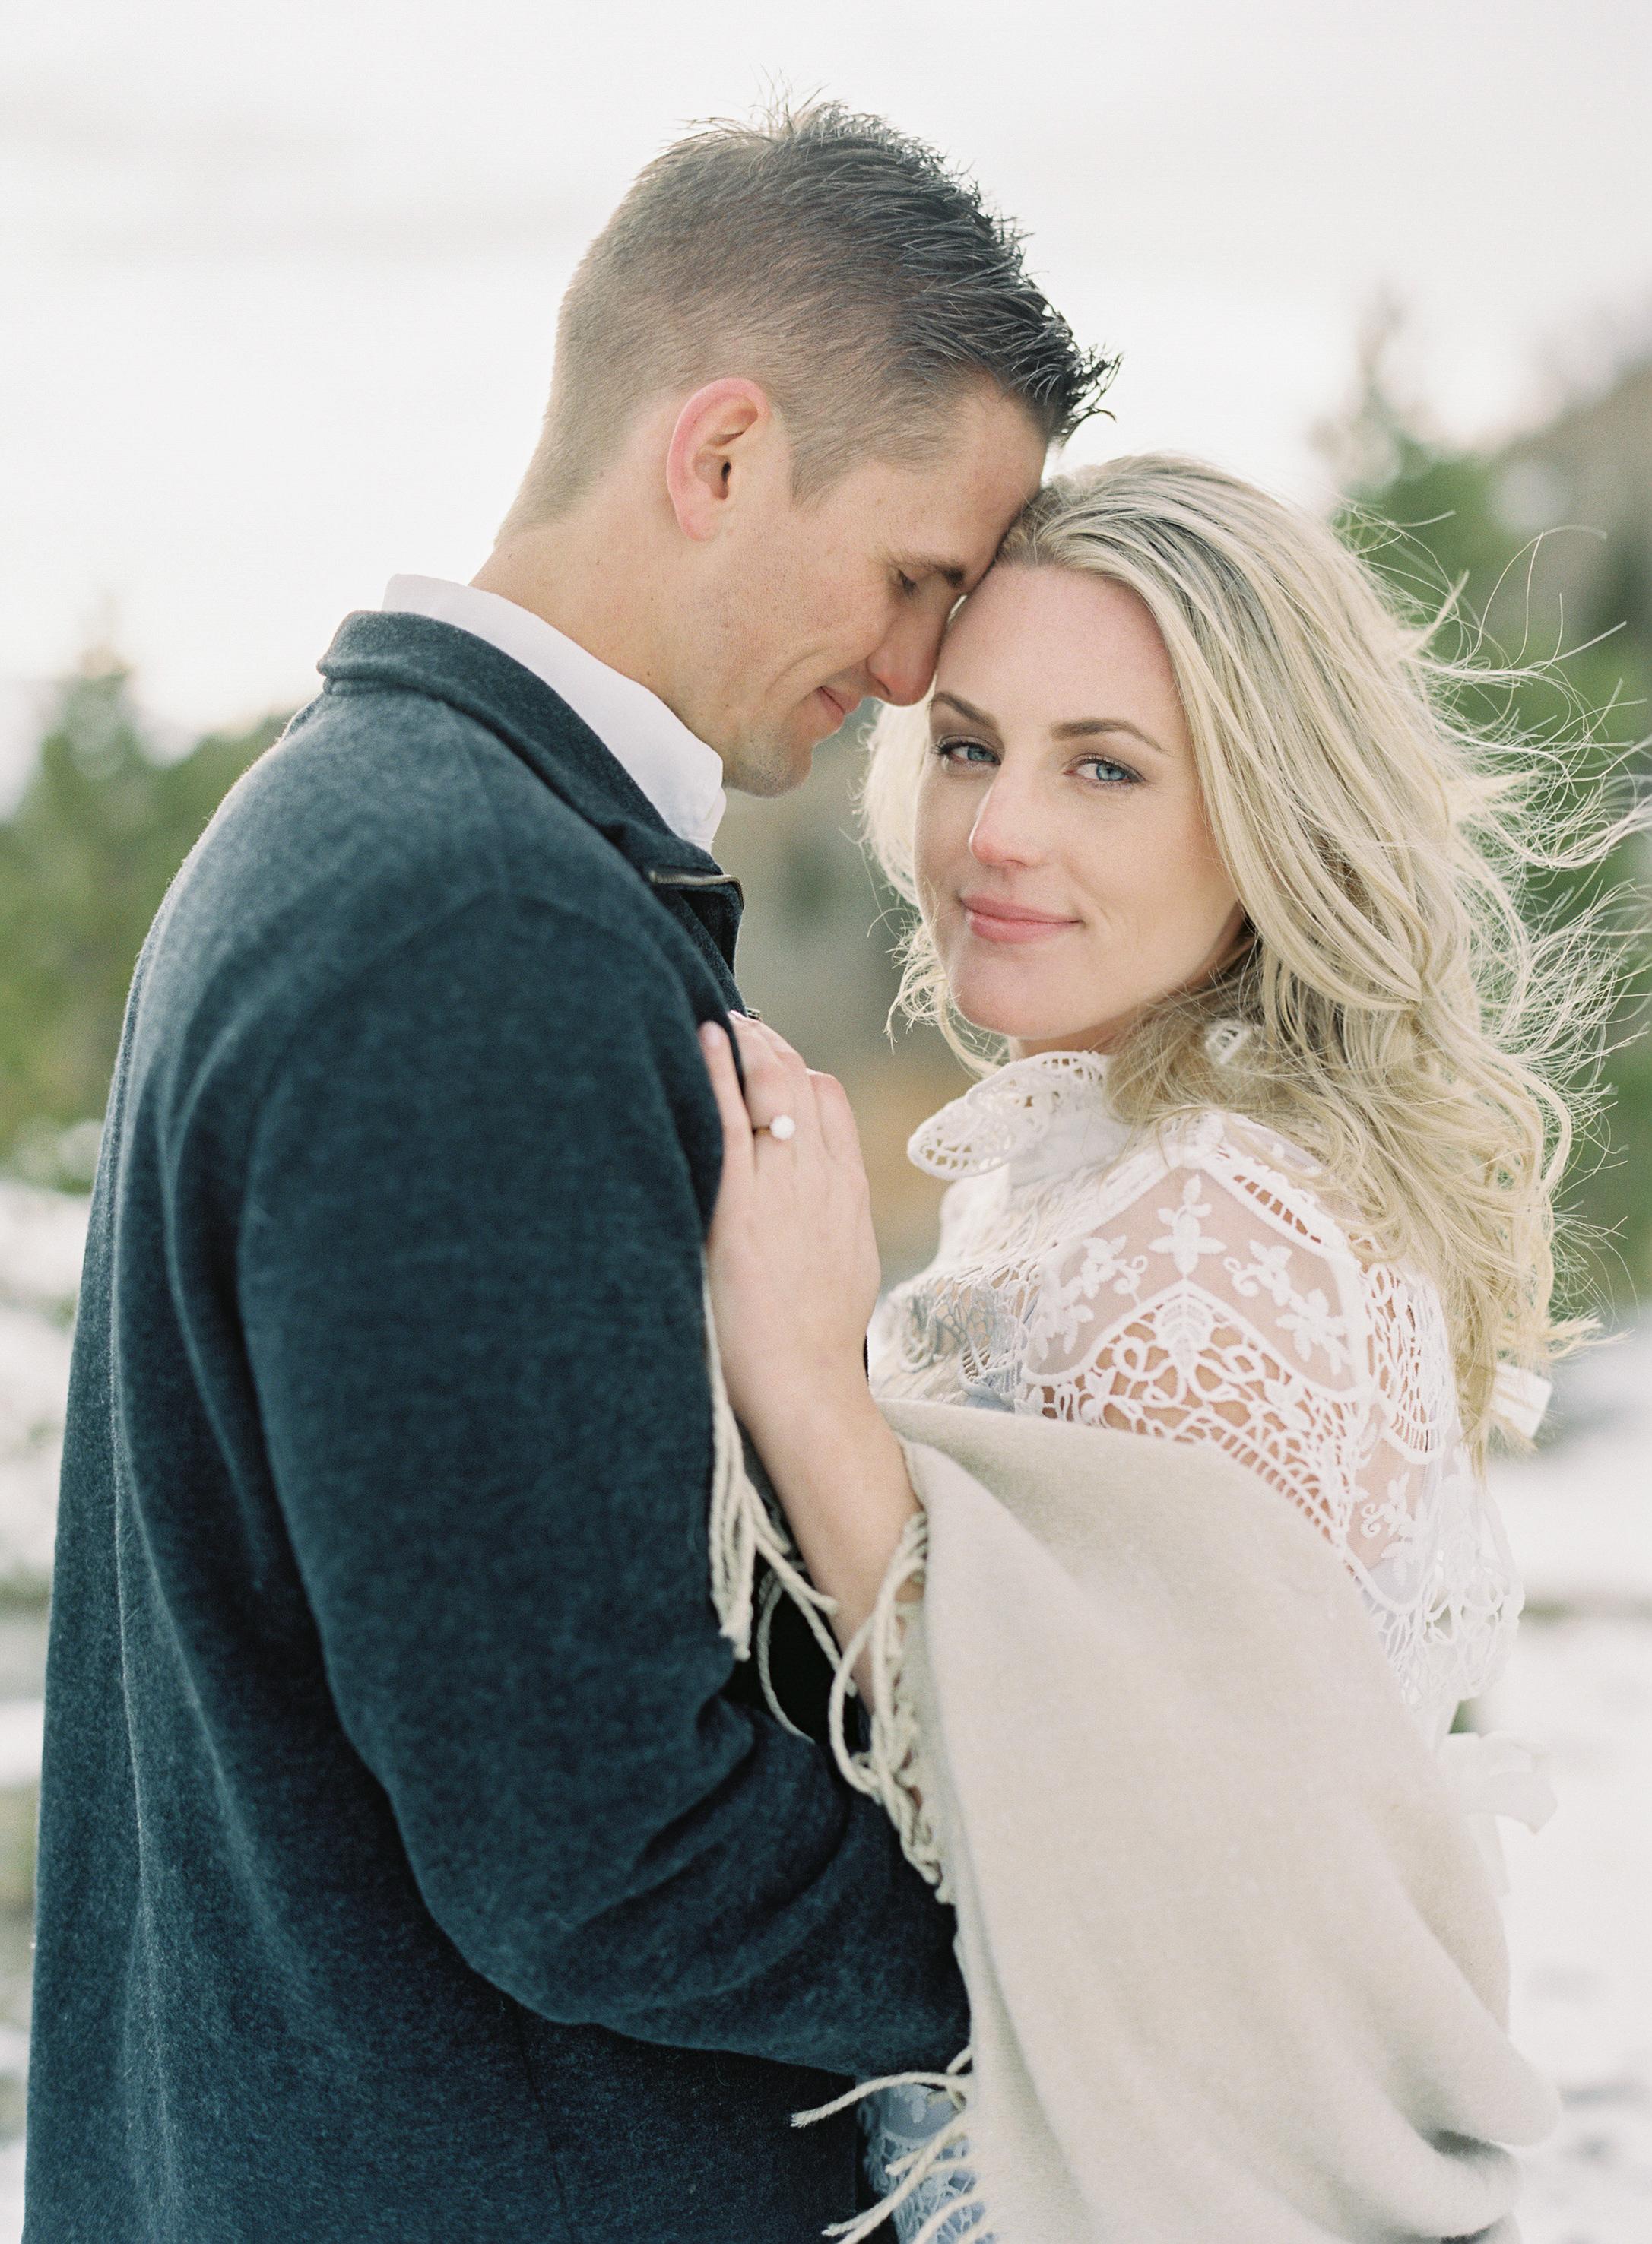 Sarah and John Engaged-Carrie King Photographer85.jpg